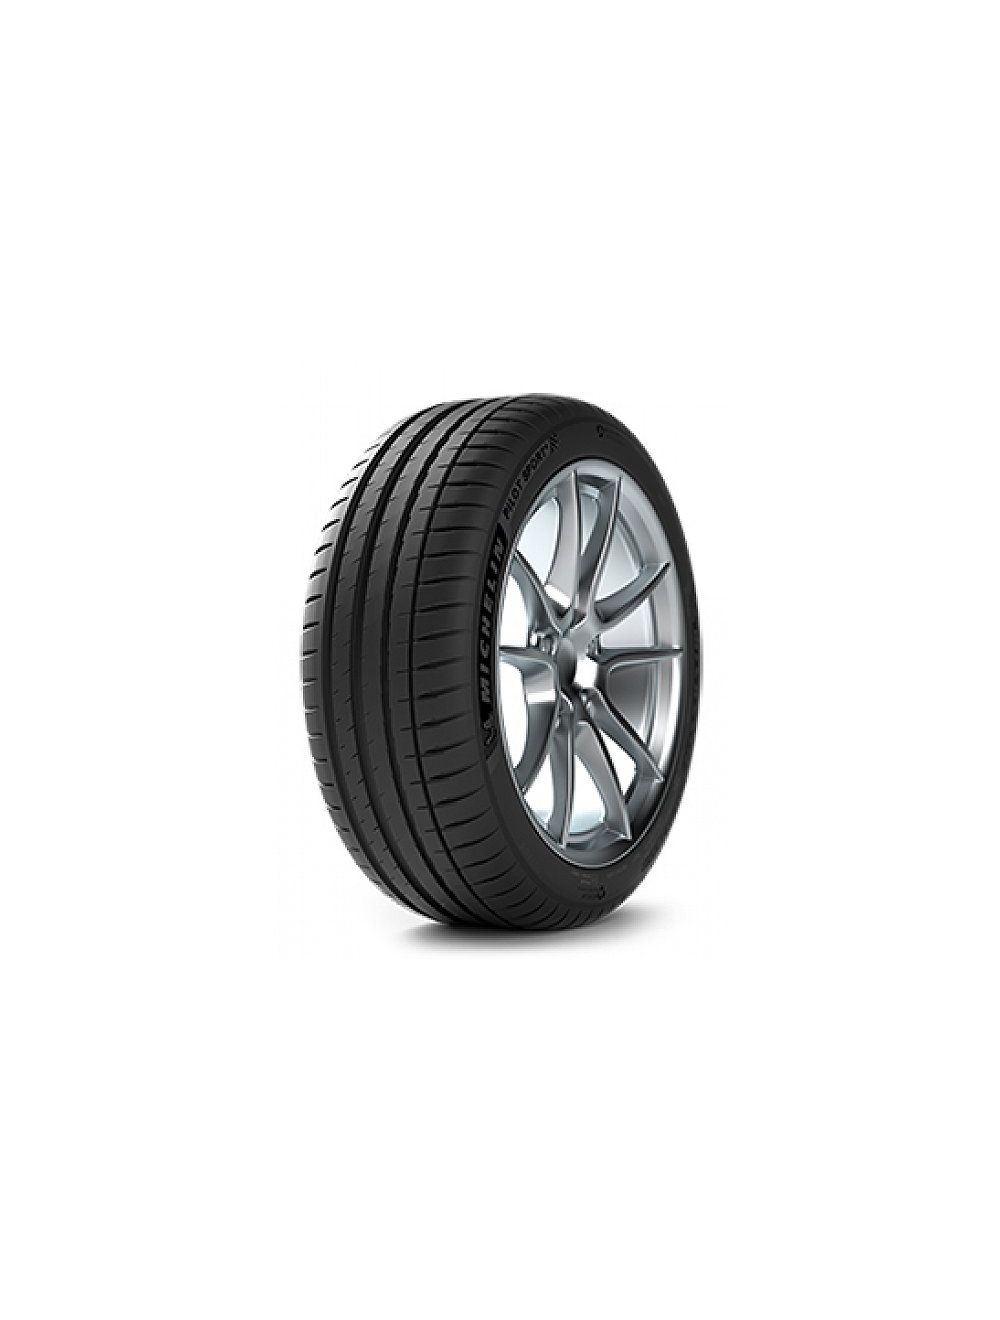 Michelin 225/45R18 Y Pilot Sport 4 XL ZP * Nyári gumi